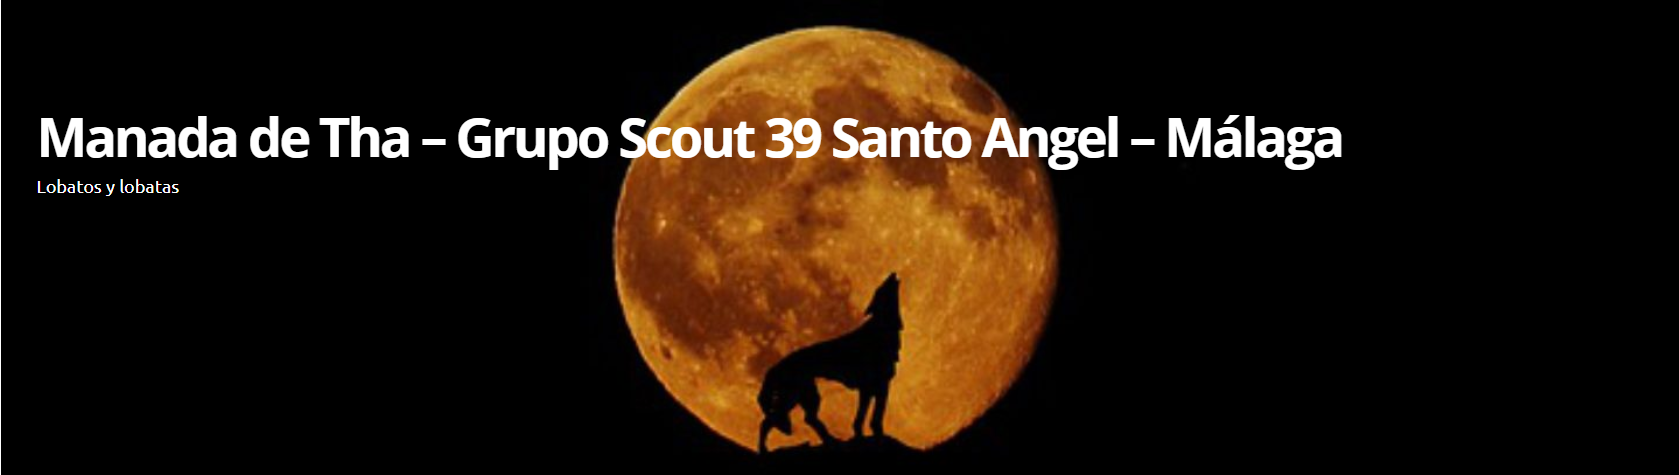 Manada de Tha – Grupo Scout 39 Santo Angel – Málaga